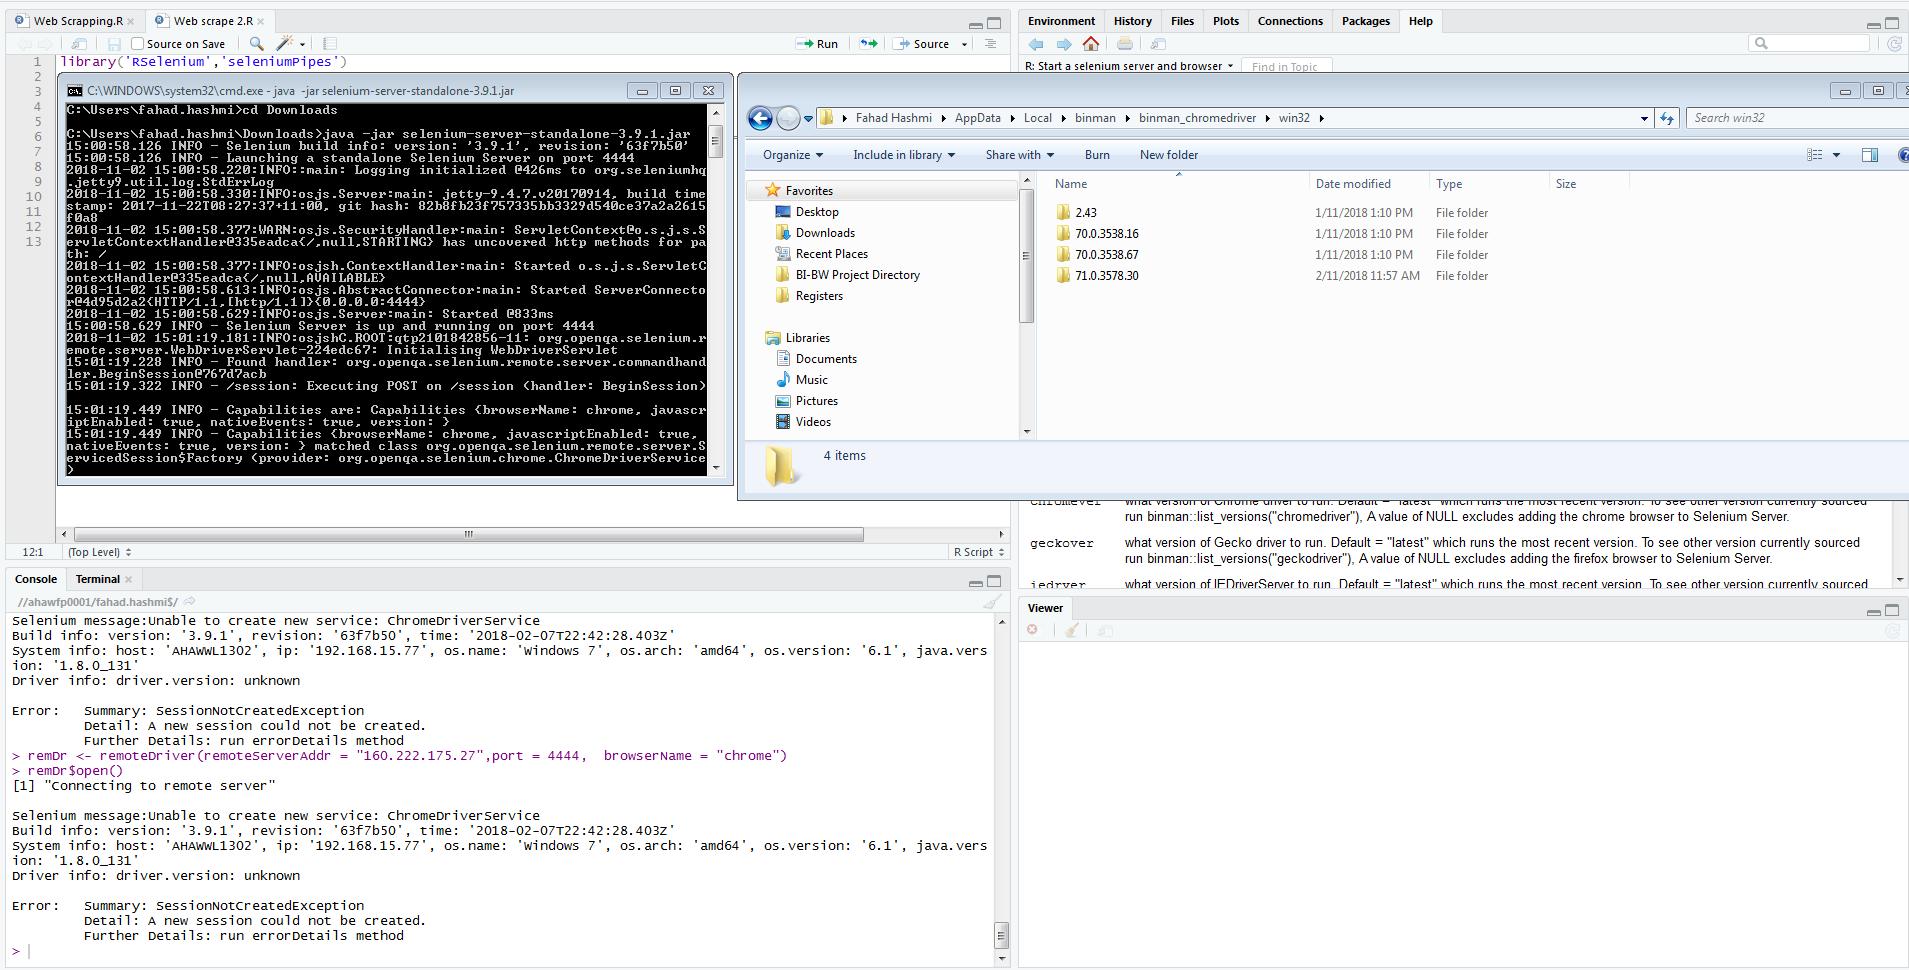 driver version unknown, error in parse_con · Issue #190